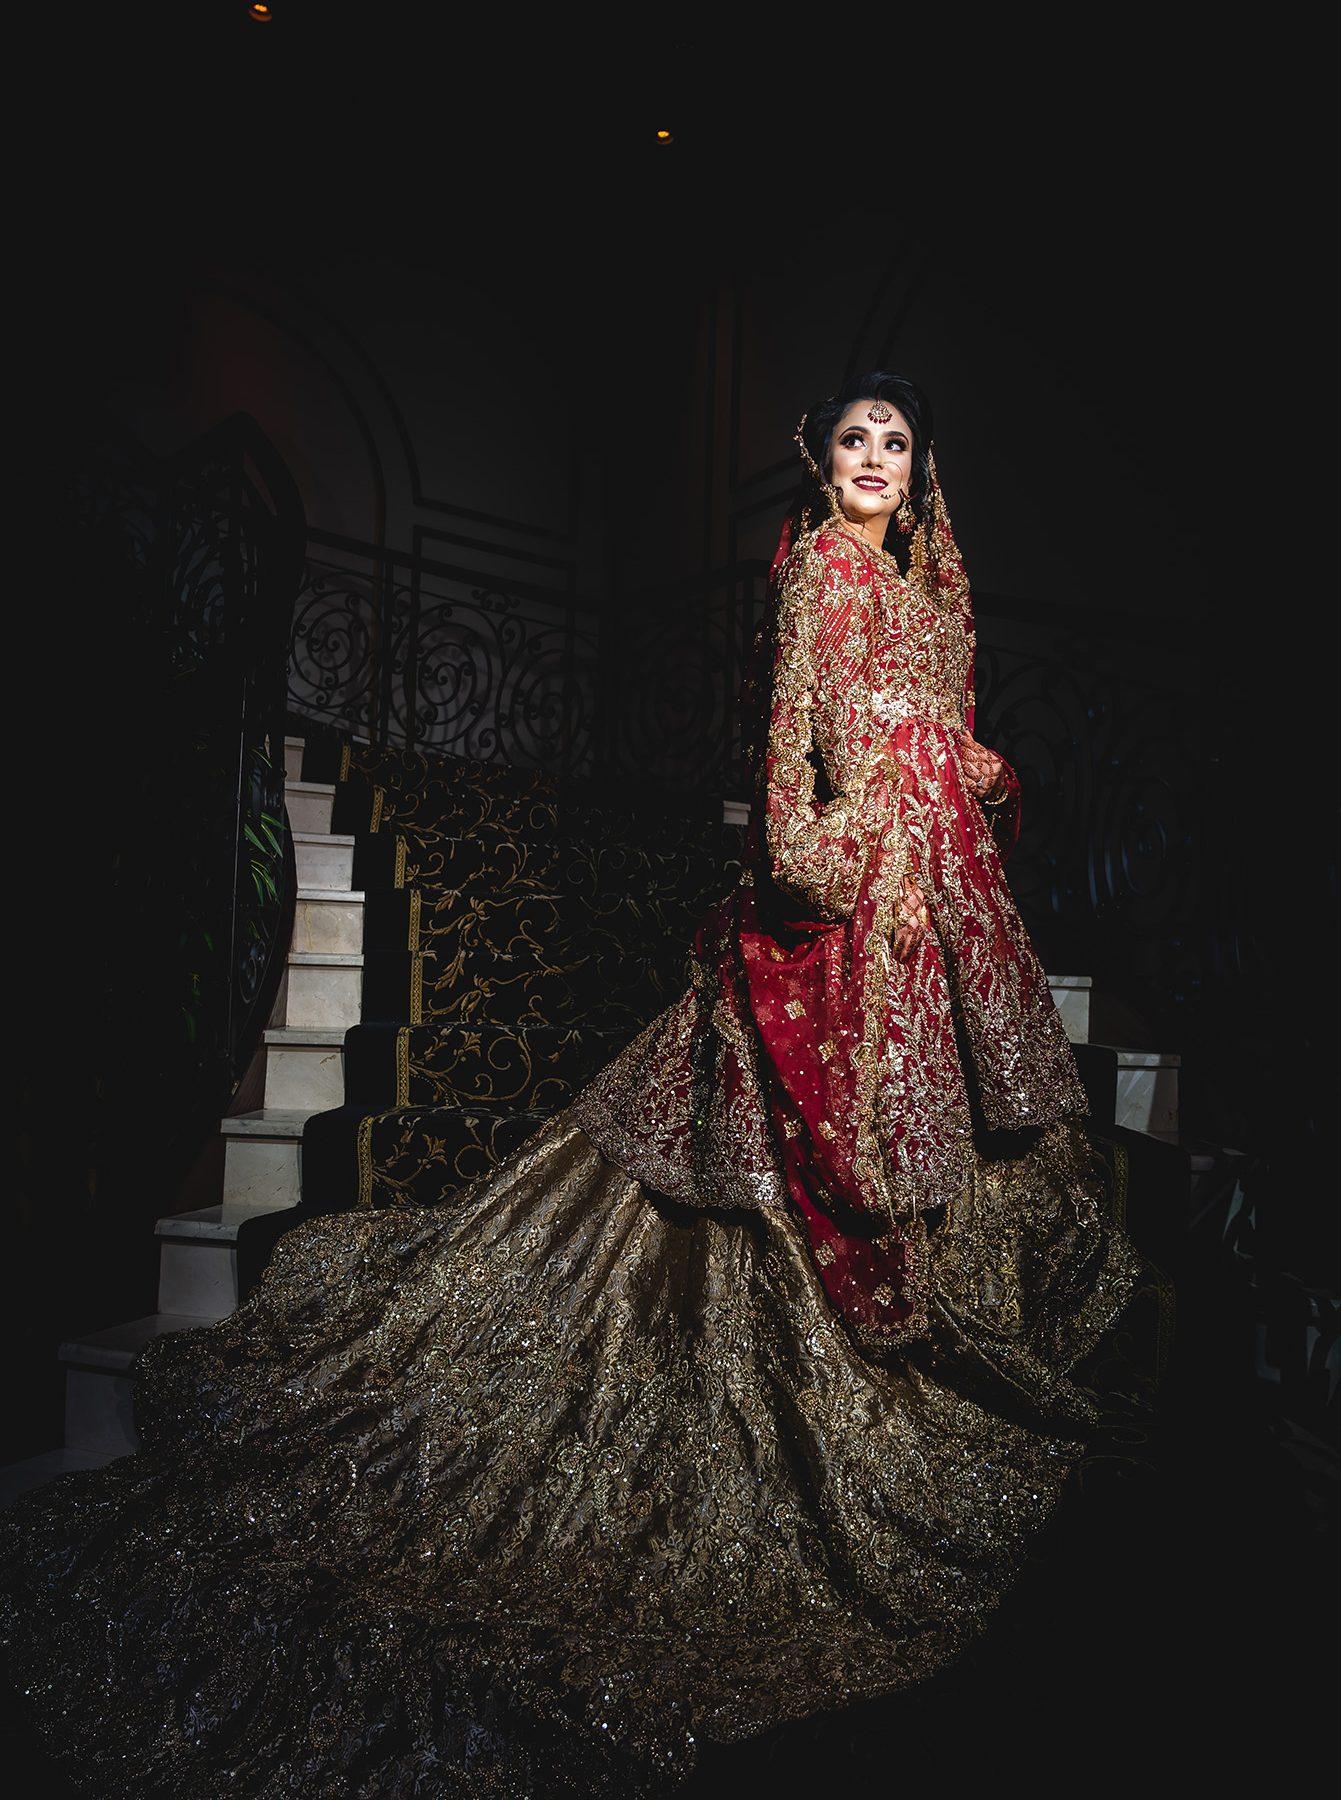 The-Tides-Estate-Wedding-Photo-1341x1800 SOUTH ASIAN WEDDINGS